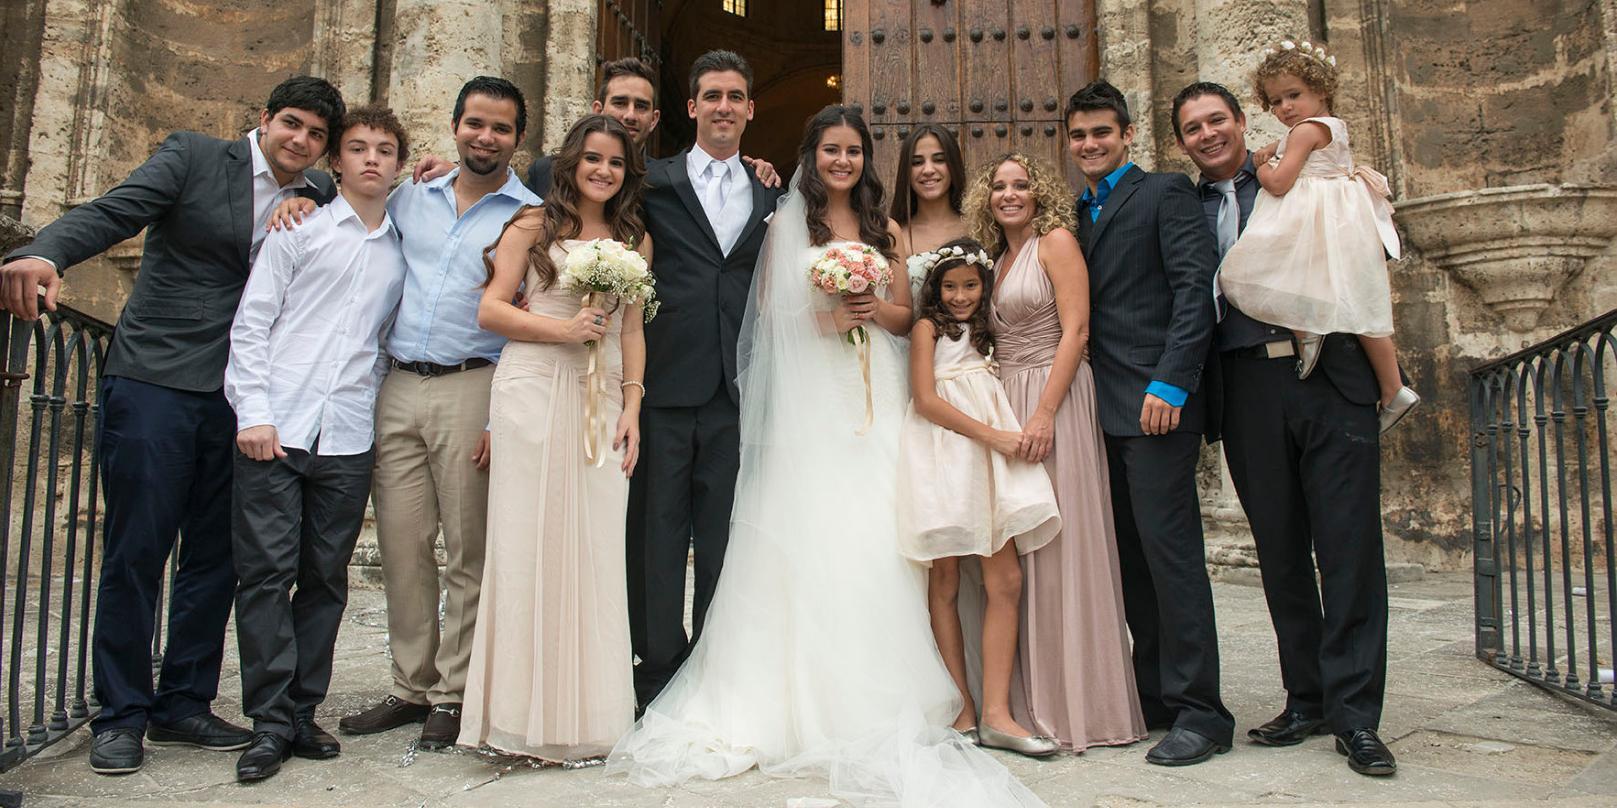 bodas-sin-clasificar-sin-tema-cuba-15571.jpg